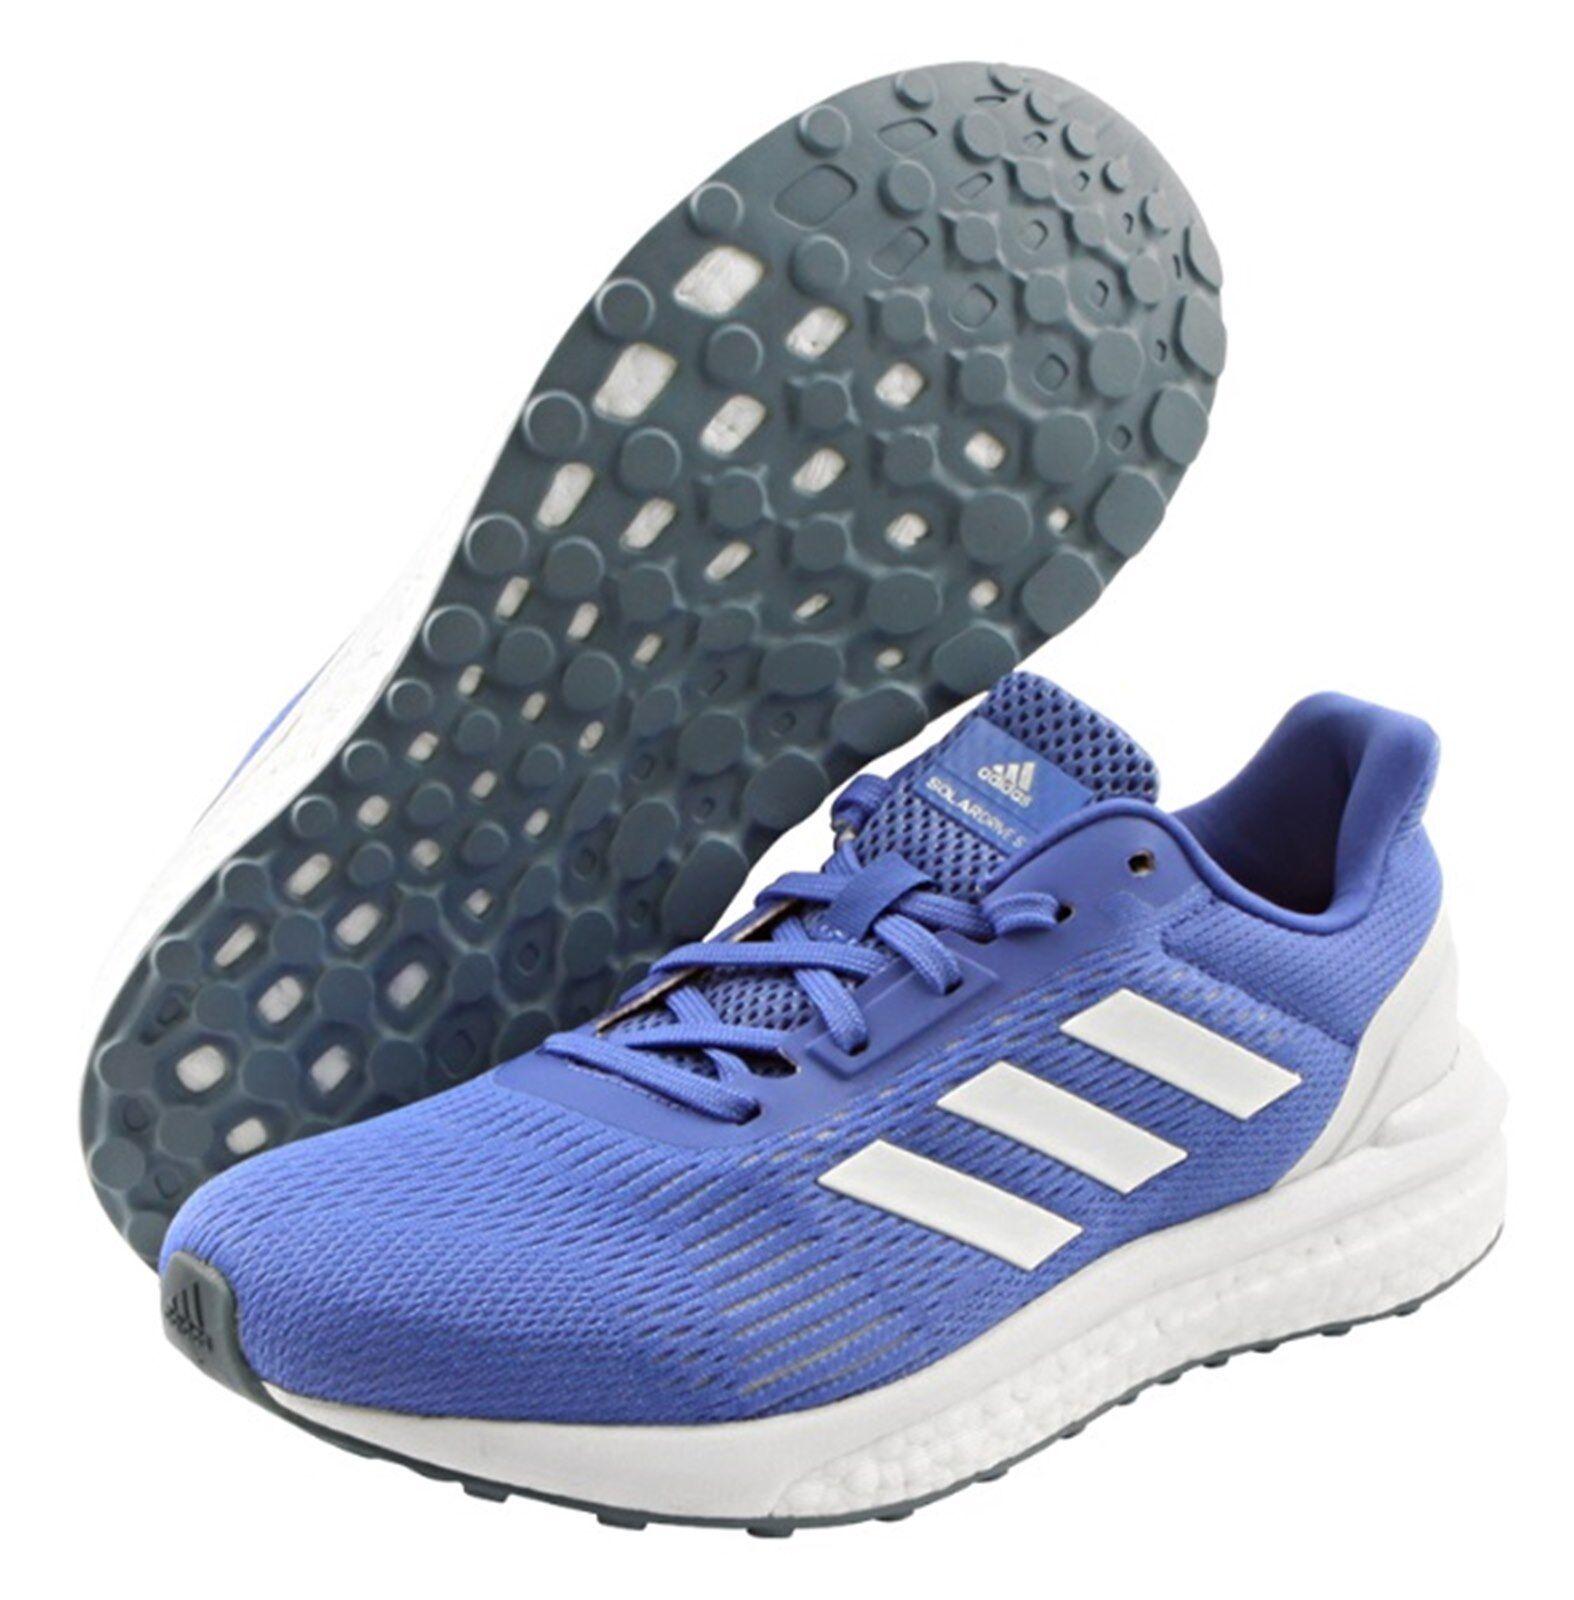 Adidas Women Solar Drive ST Training shoes Running  blueeeeeeeee Athletic Sneakers AQ0328  for sale